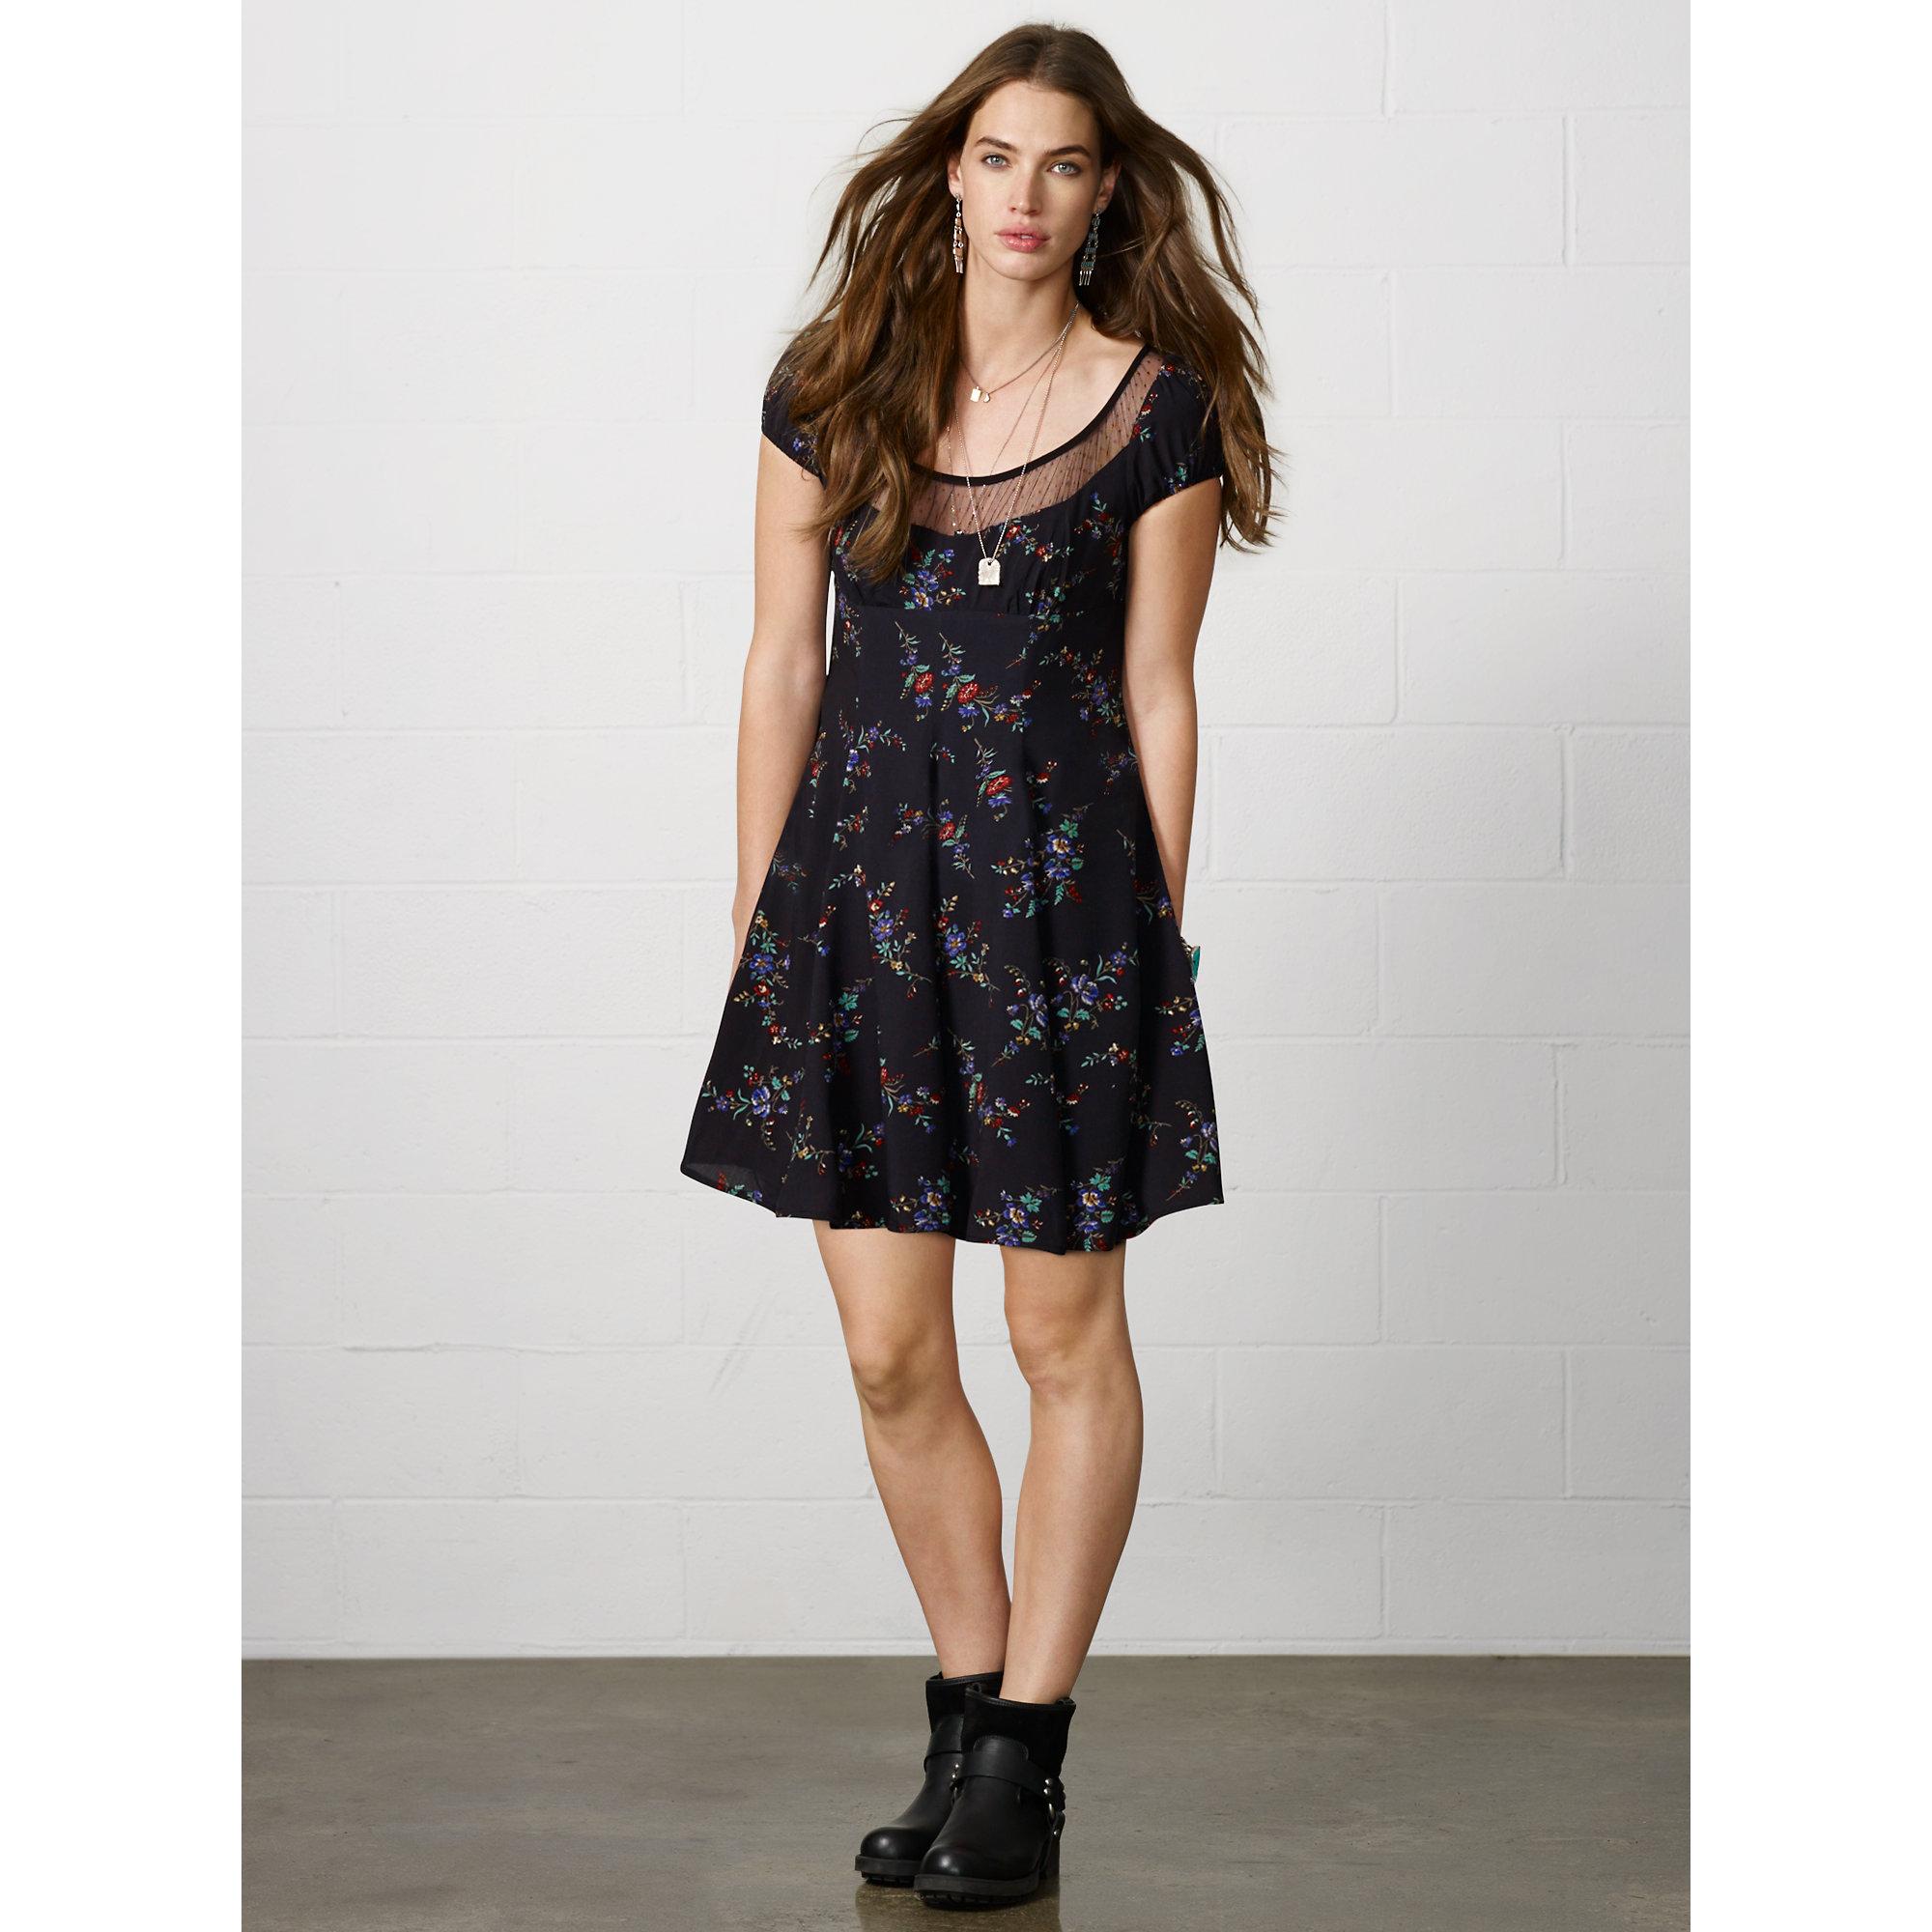 Lyst Denim & Supply Ralph Lauren Floral Babydoll Dress in Black